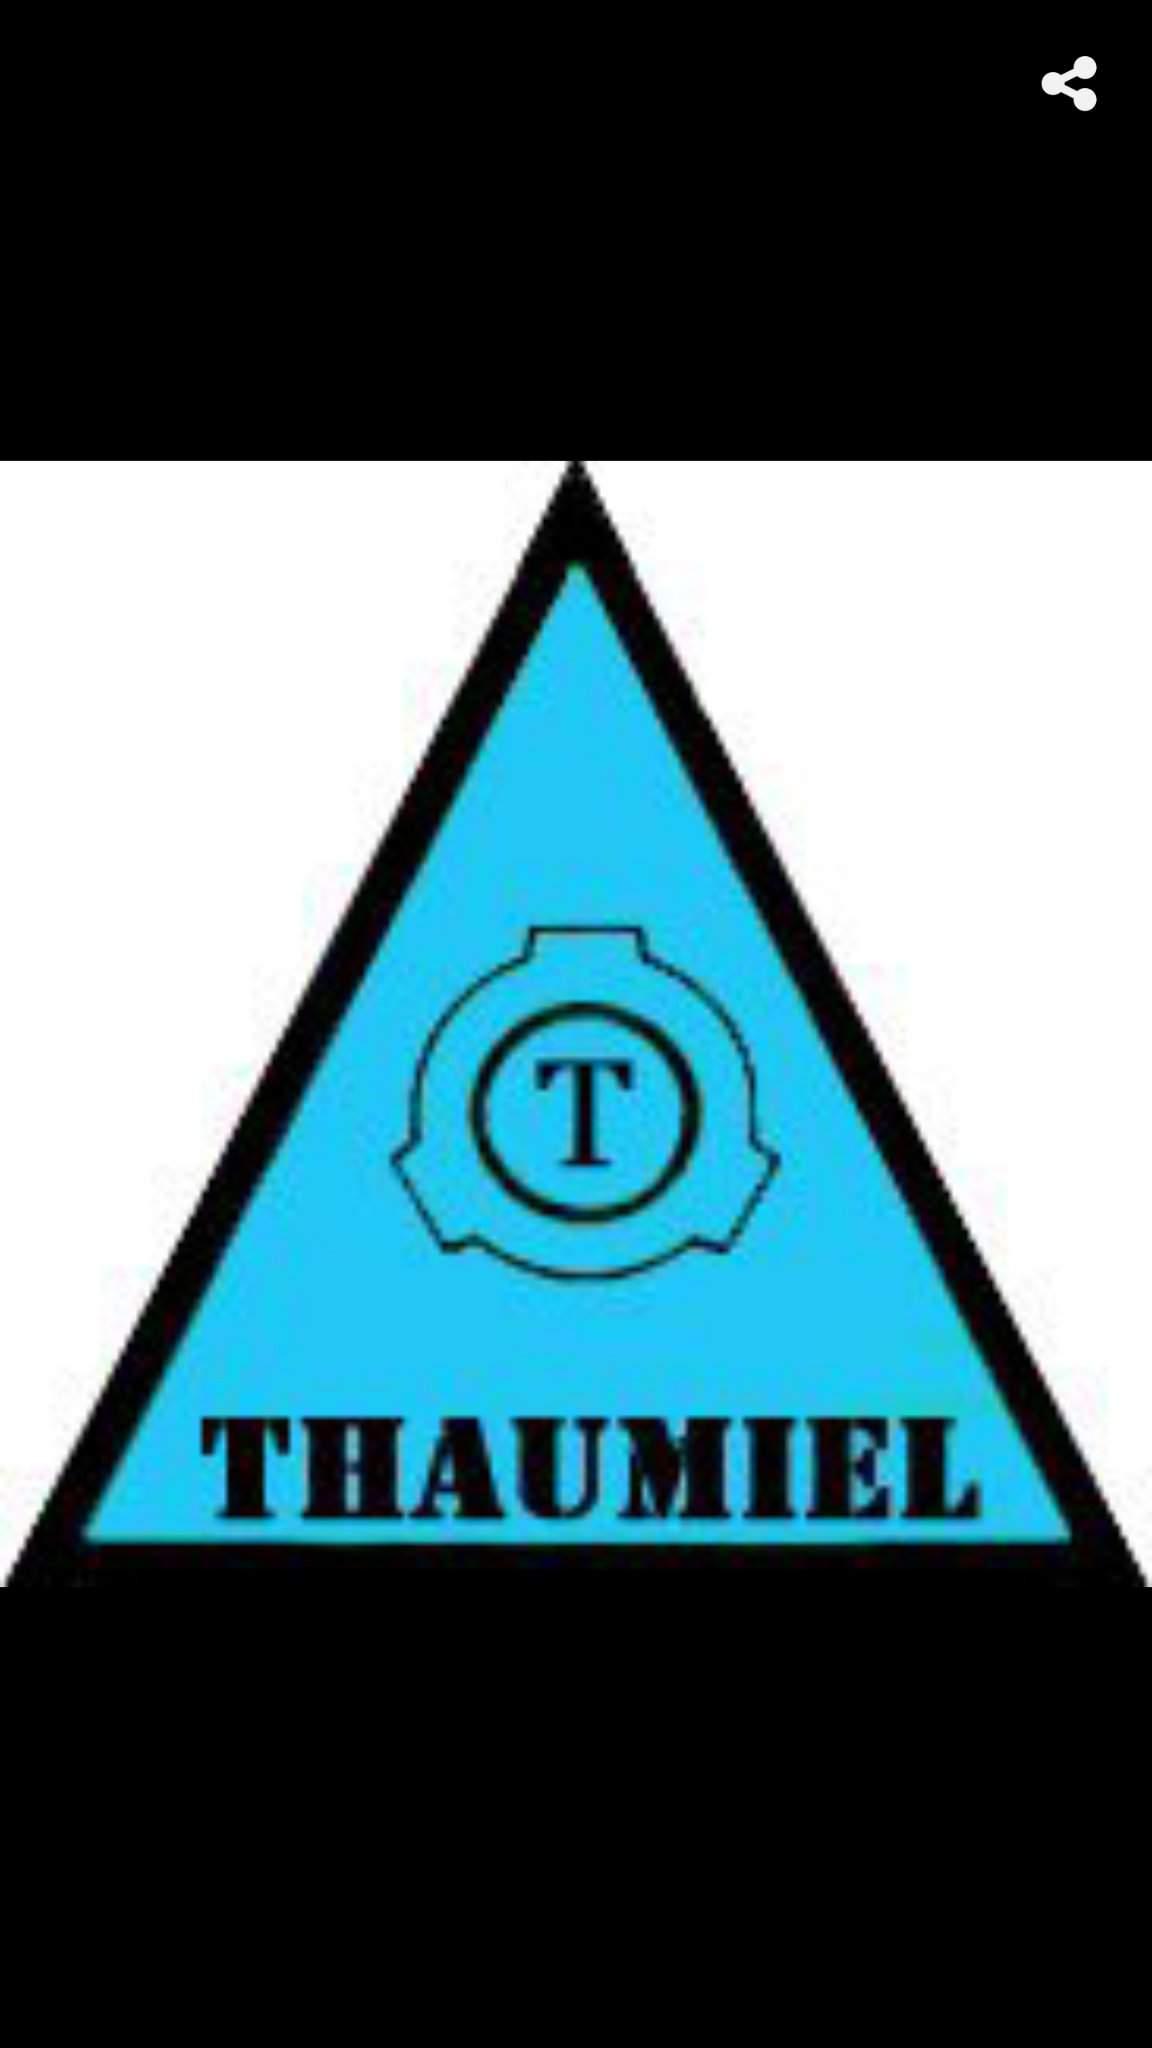 Thaumiel Wiki Scp Foundation Amino 11 thaumiel 11.0°.(sphere of anu/tiamat) the black hole. amino apps